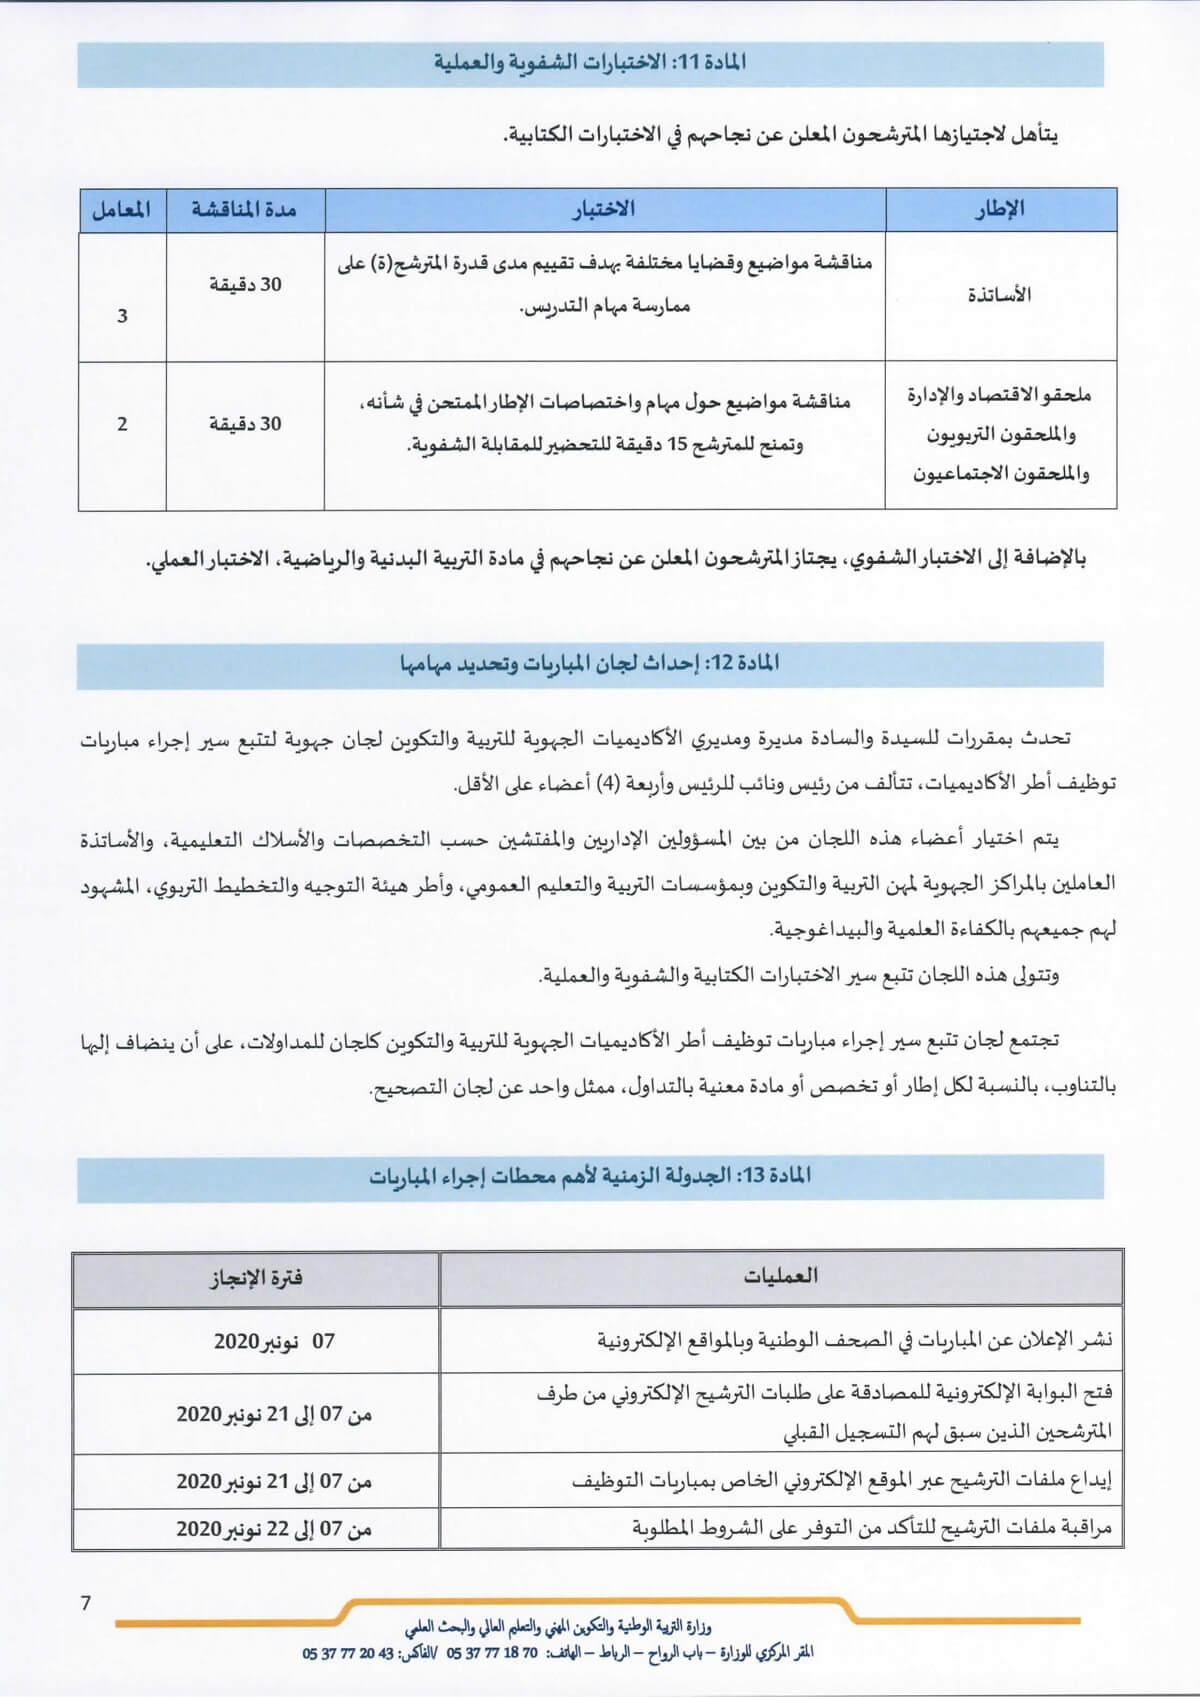 0008 1 Tawdif.men.gov.ma 2022/2021 مباراة التعليم بالتعاقد